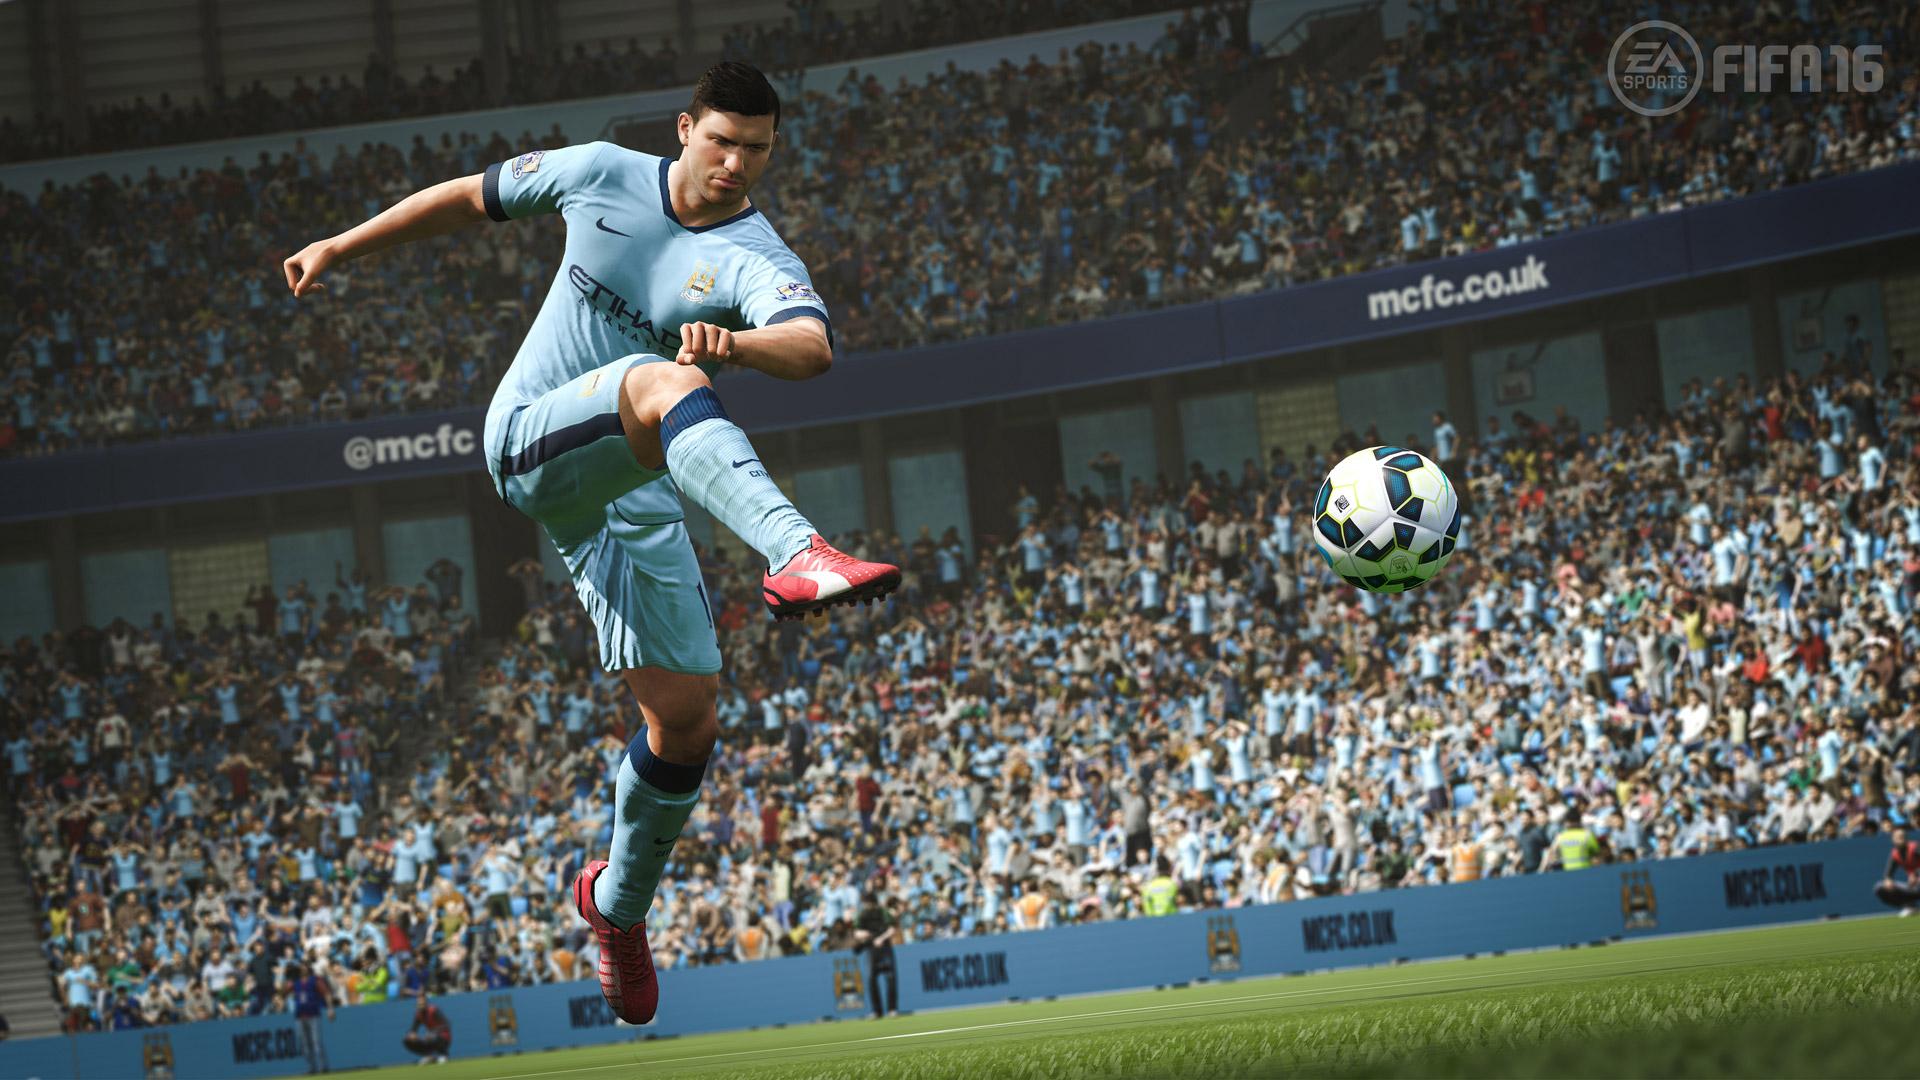 FIFA 16 wallpaper 2